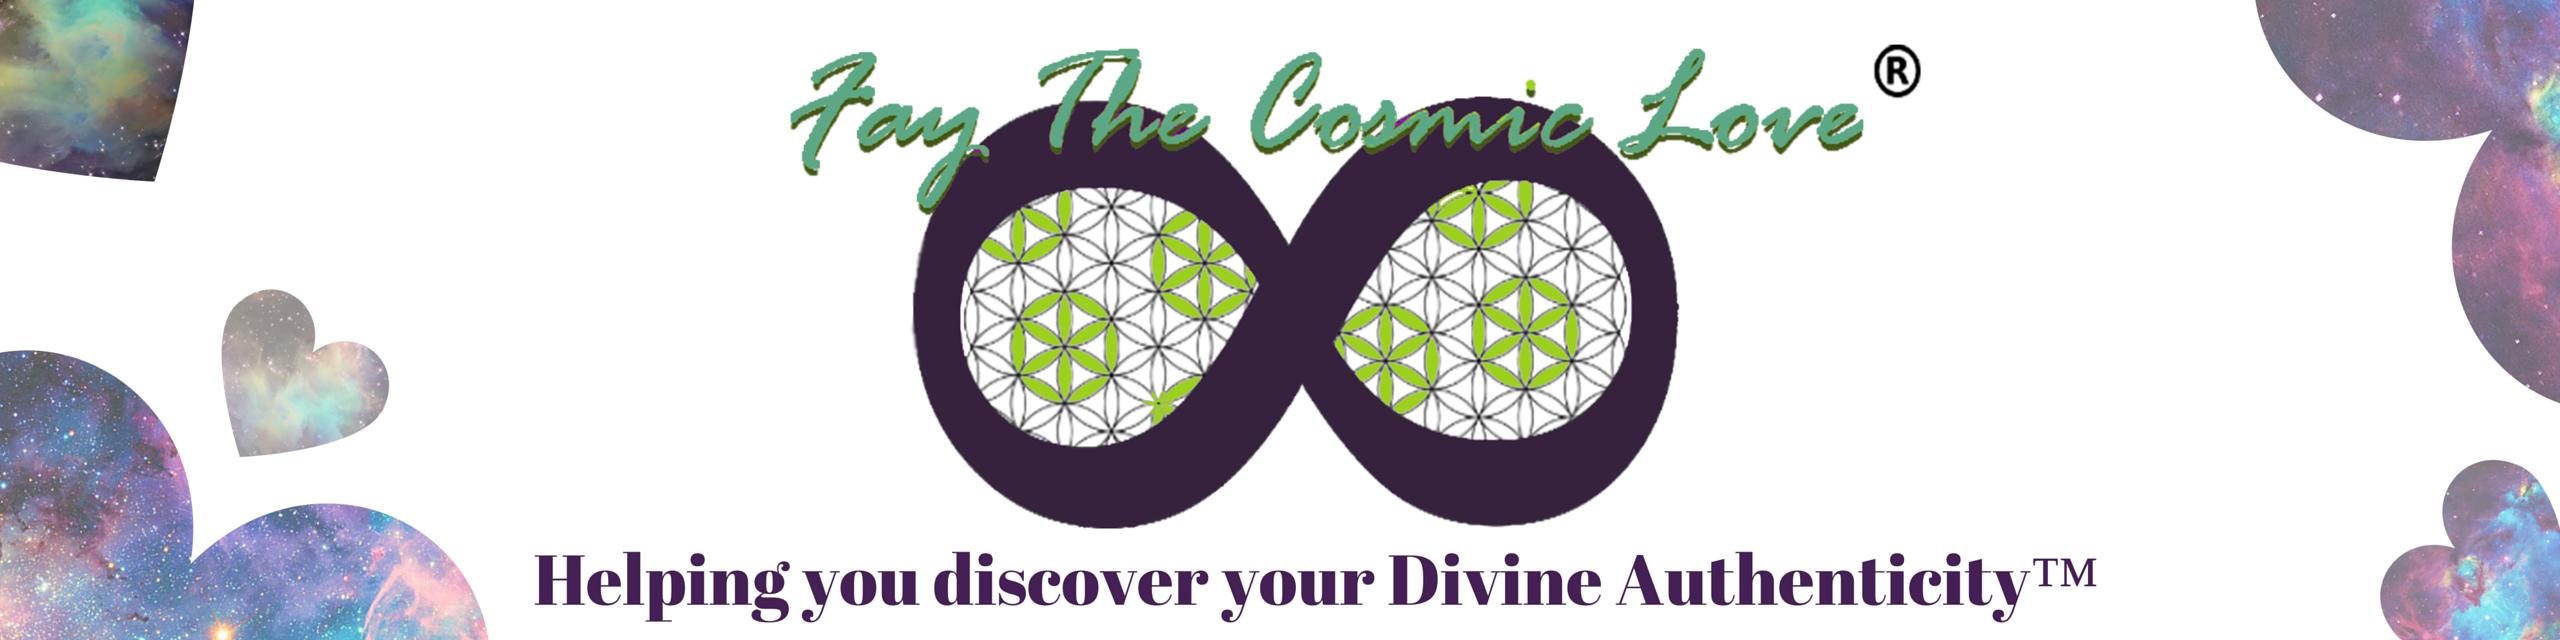 FayTheCosmicLove Blog Banner